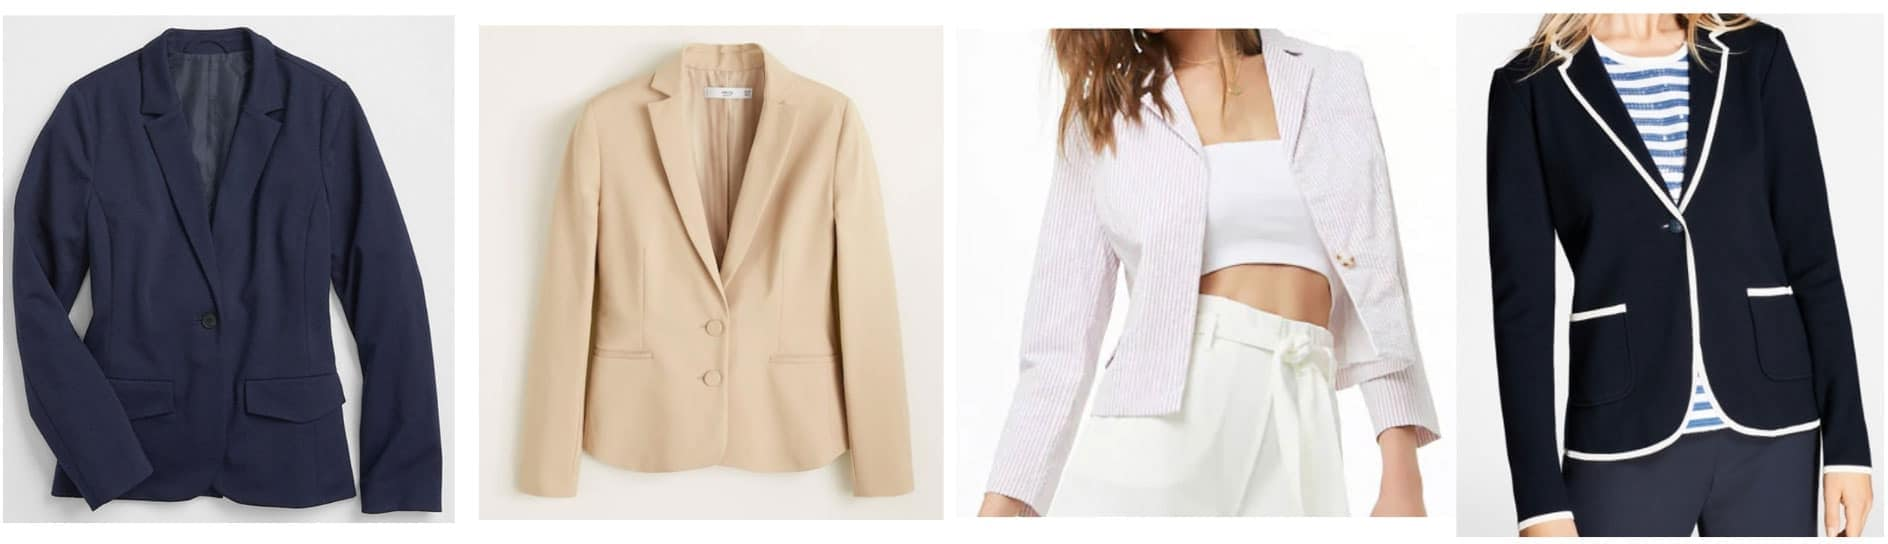 Preppy style - blazers: Navy blazer, camel blazer, pastel blazer, black and white piped blazer